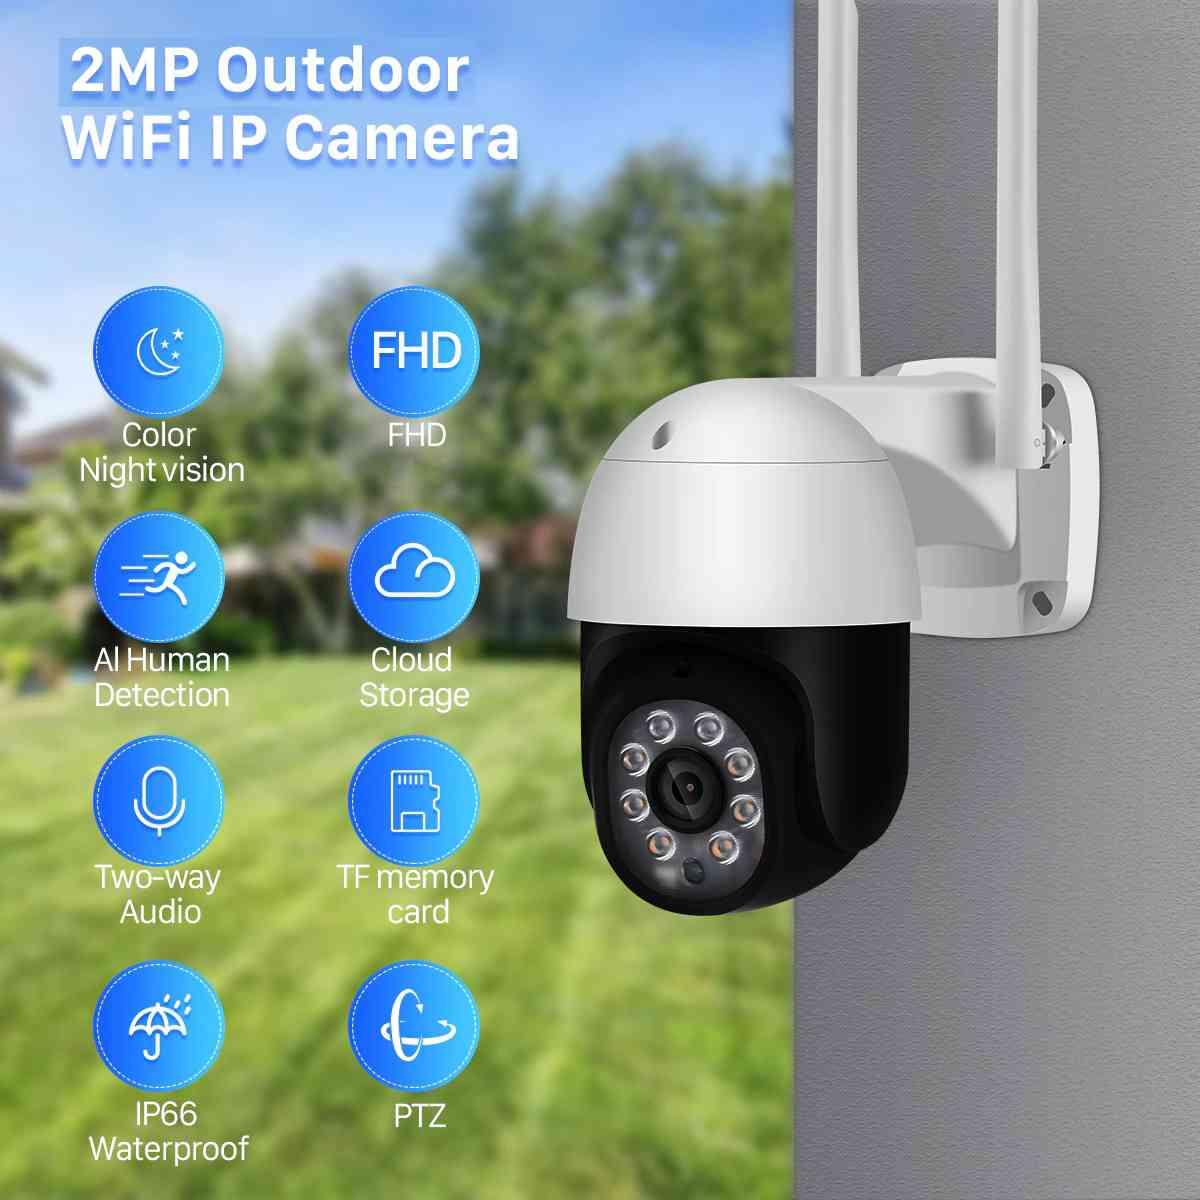 2MP Outdoor WIFI Camera